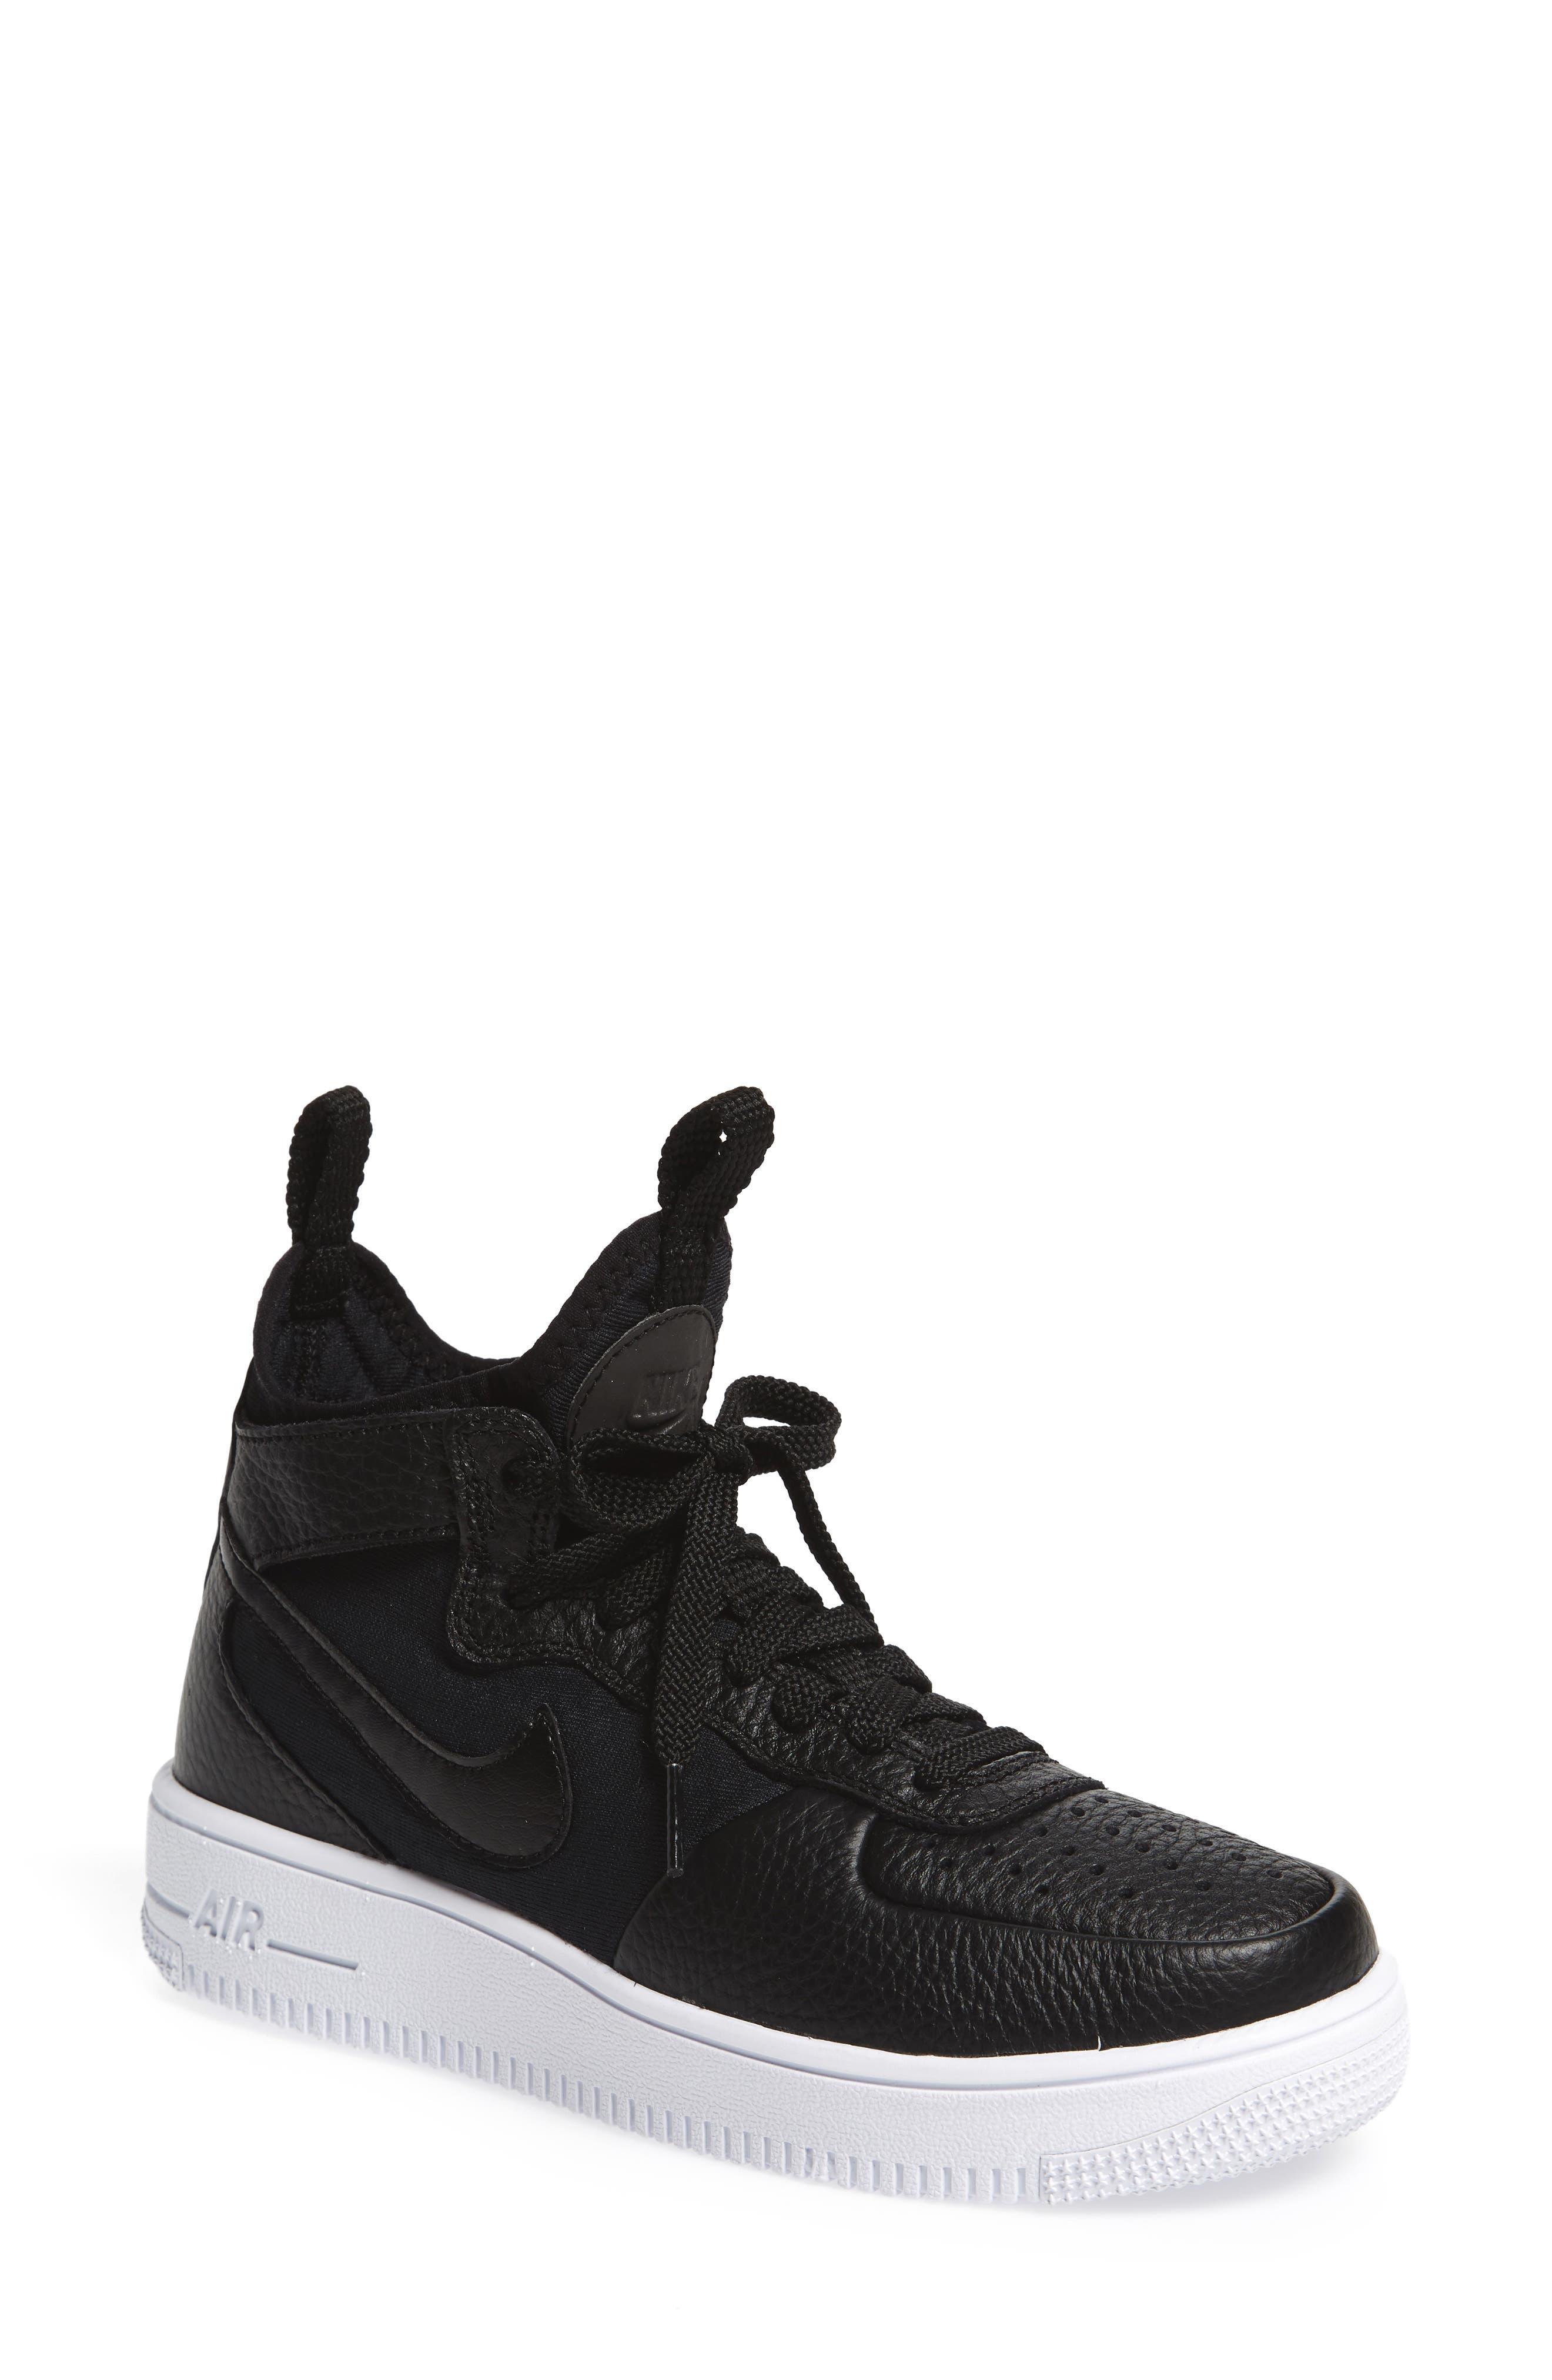 Air Force 1 Ultraforce Mid Sneaker,                             Main thumbnail 1, color,                             Black/ Black